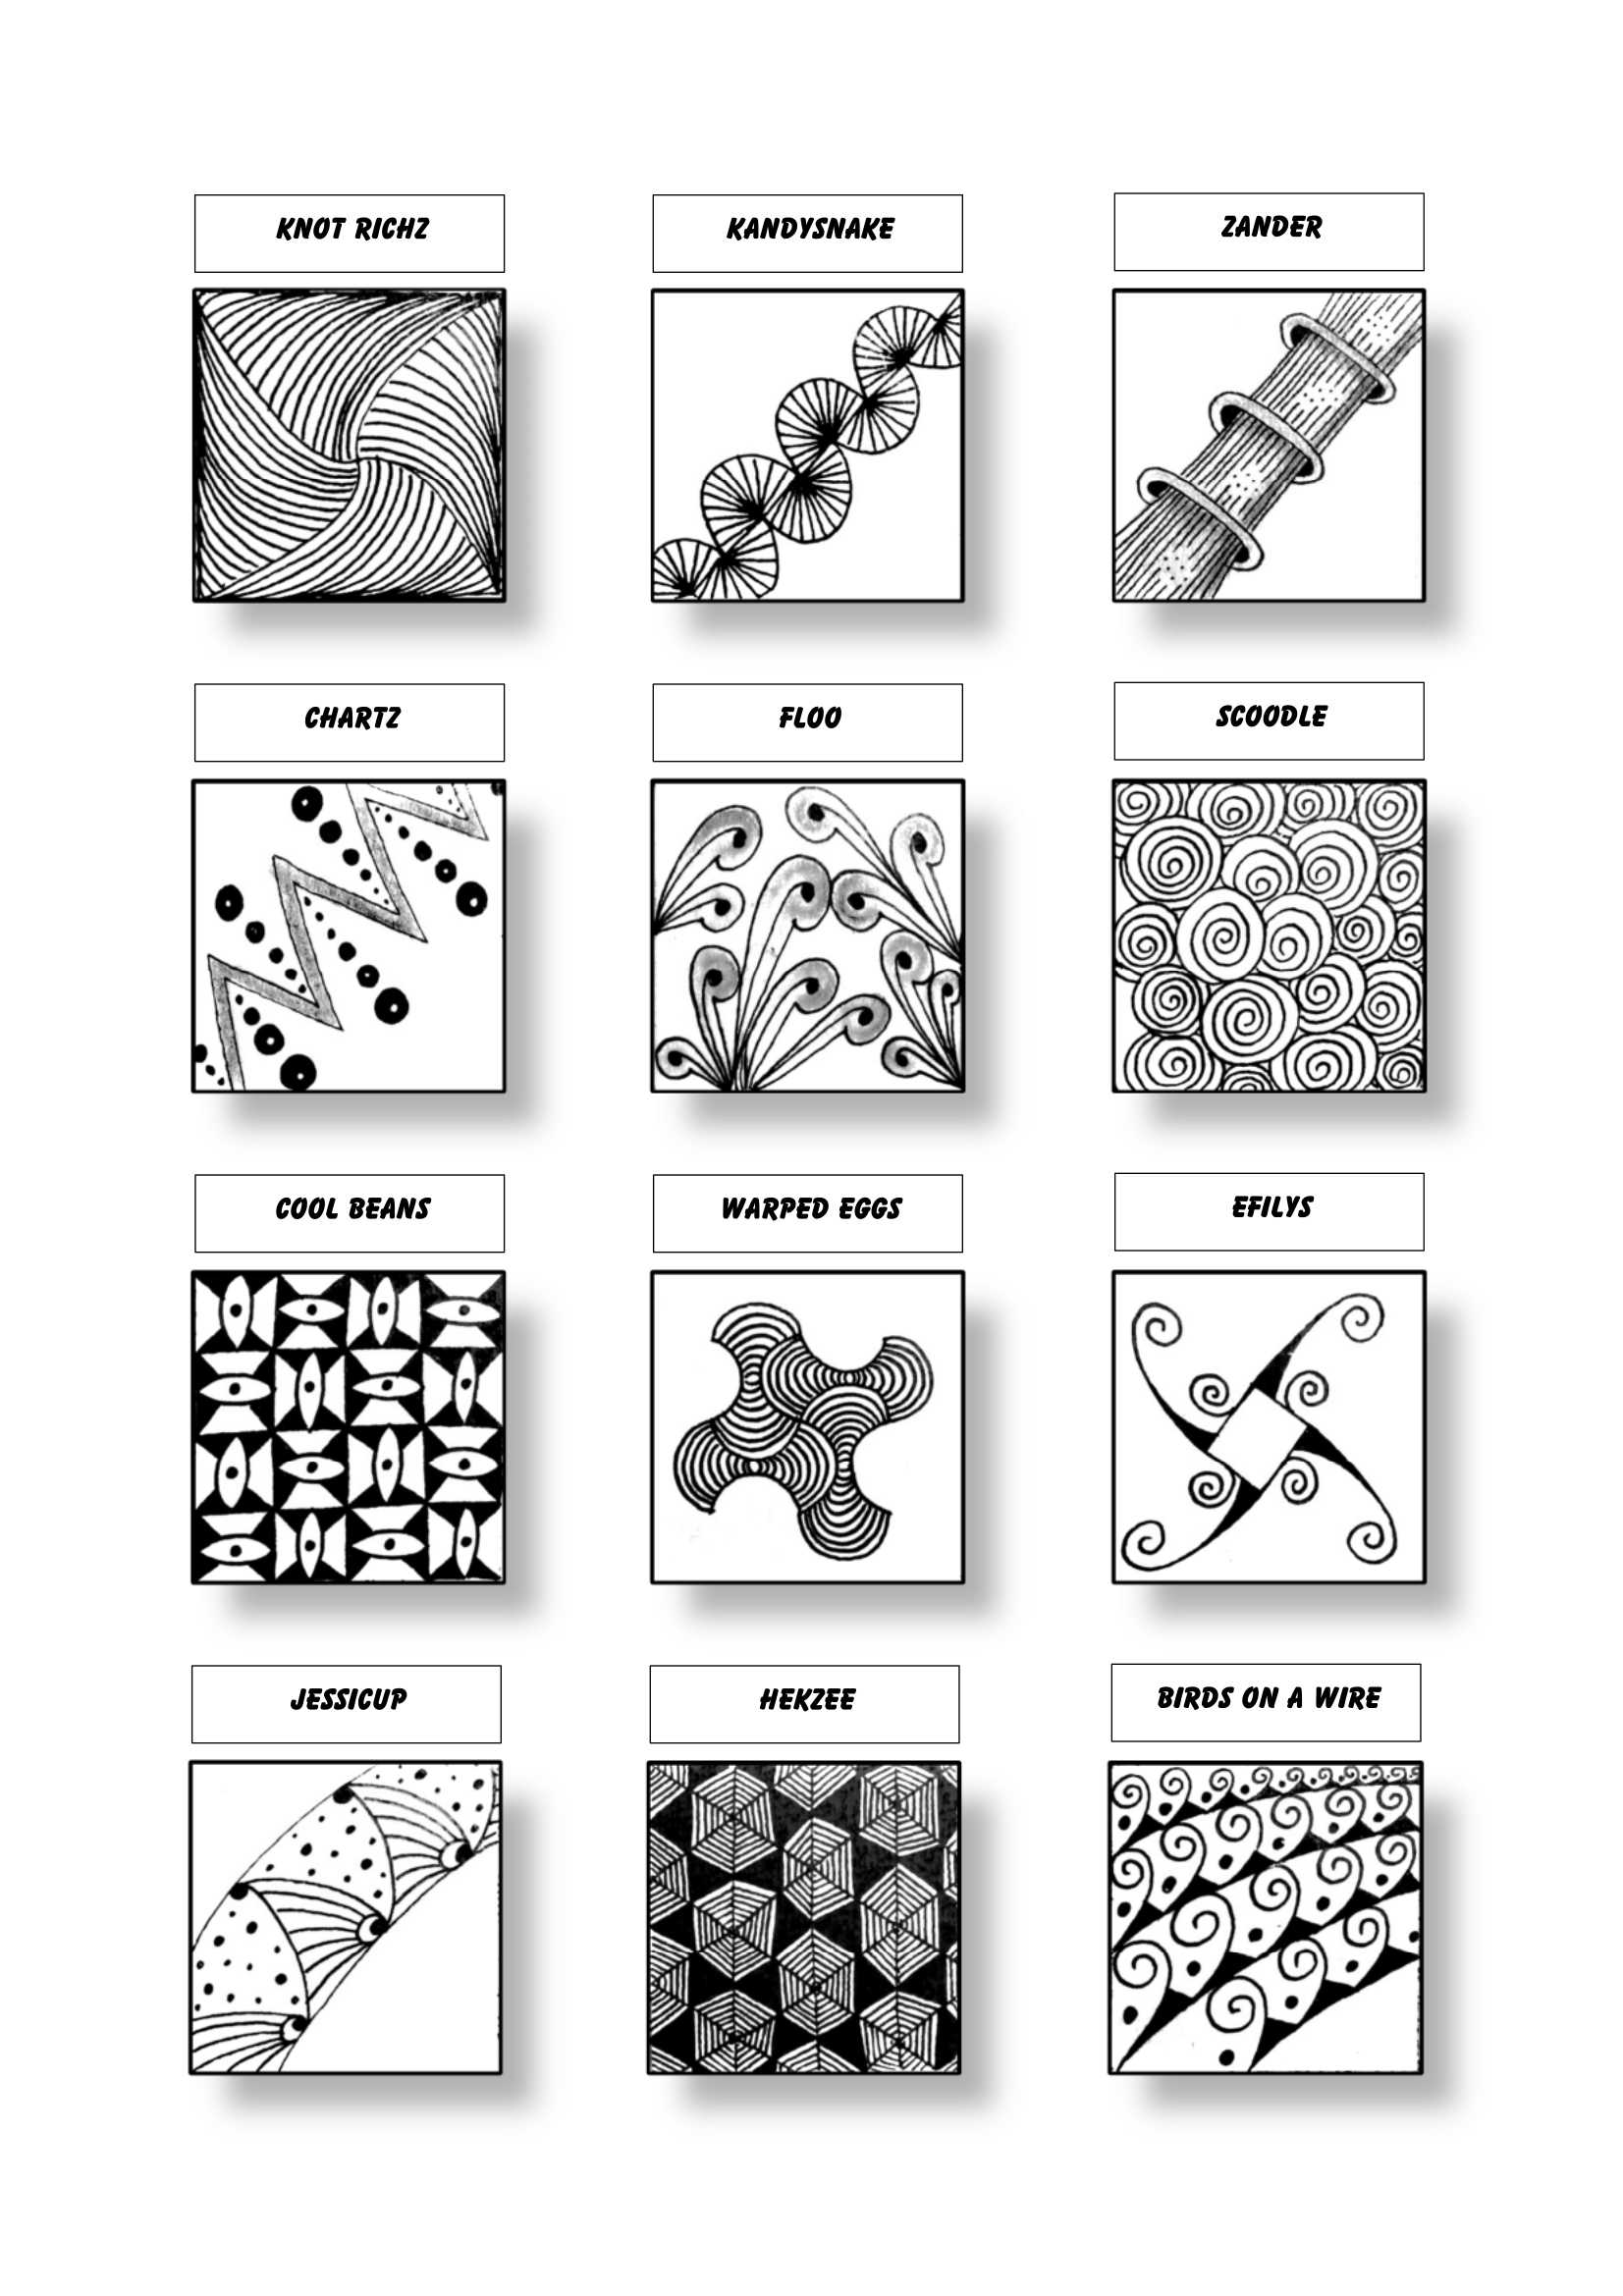 Zentangle Pattern Sheet 18 Patterns: Knot Richz